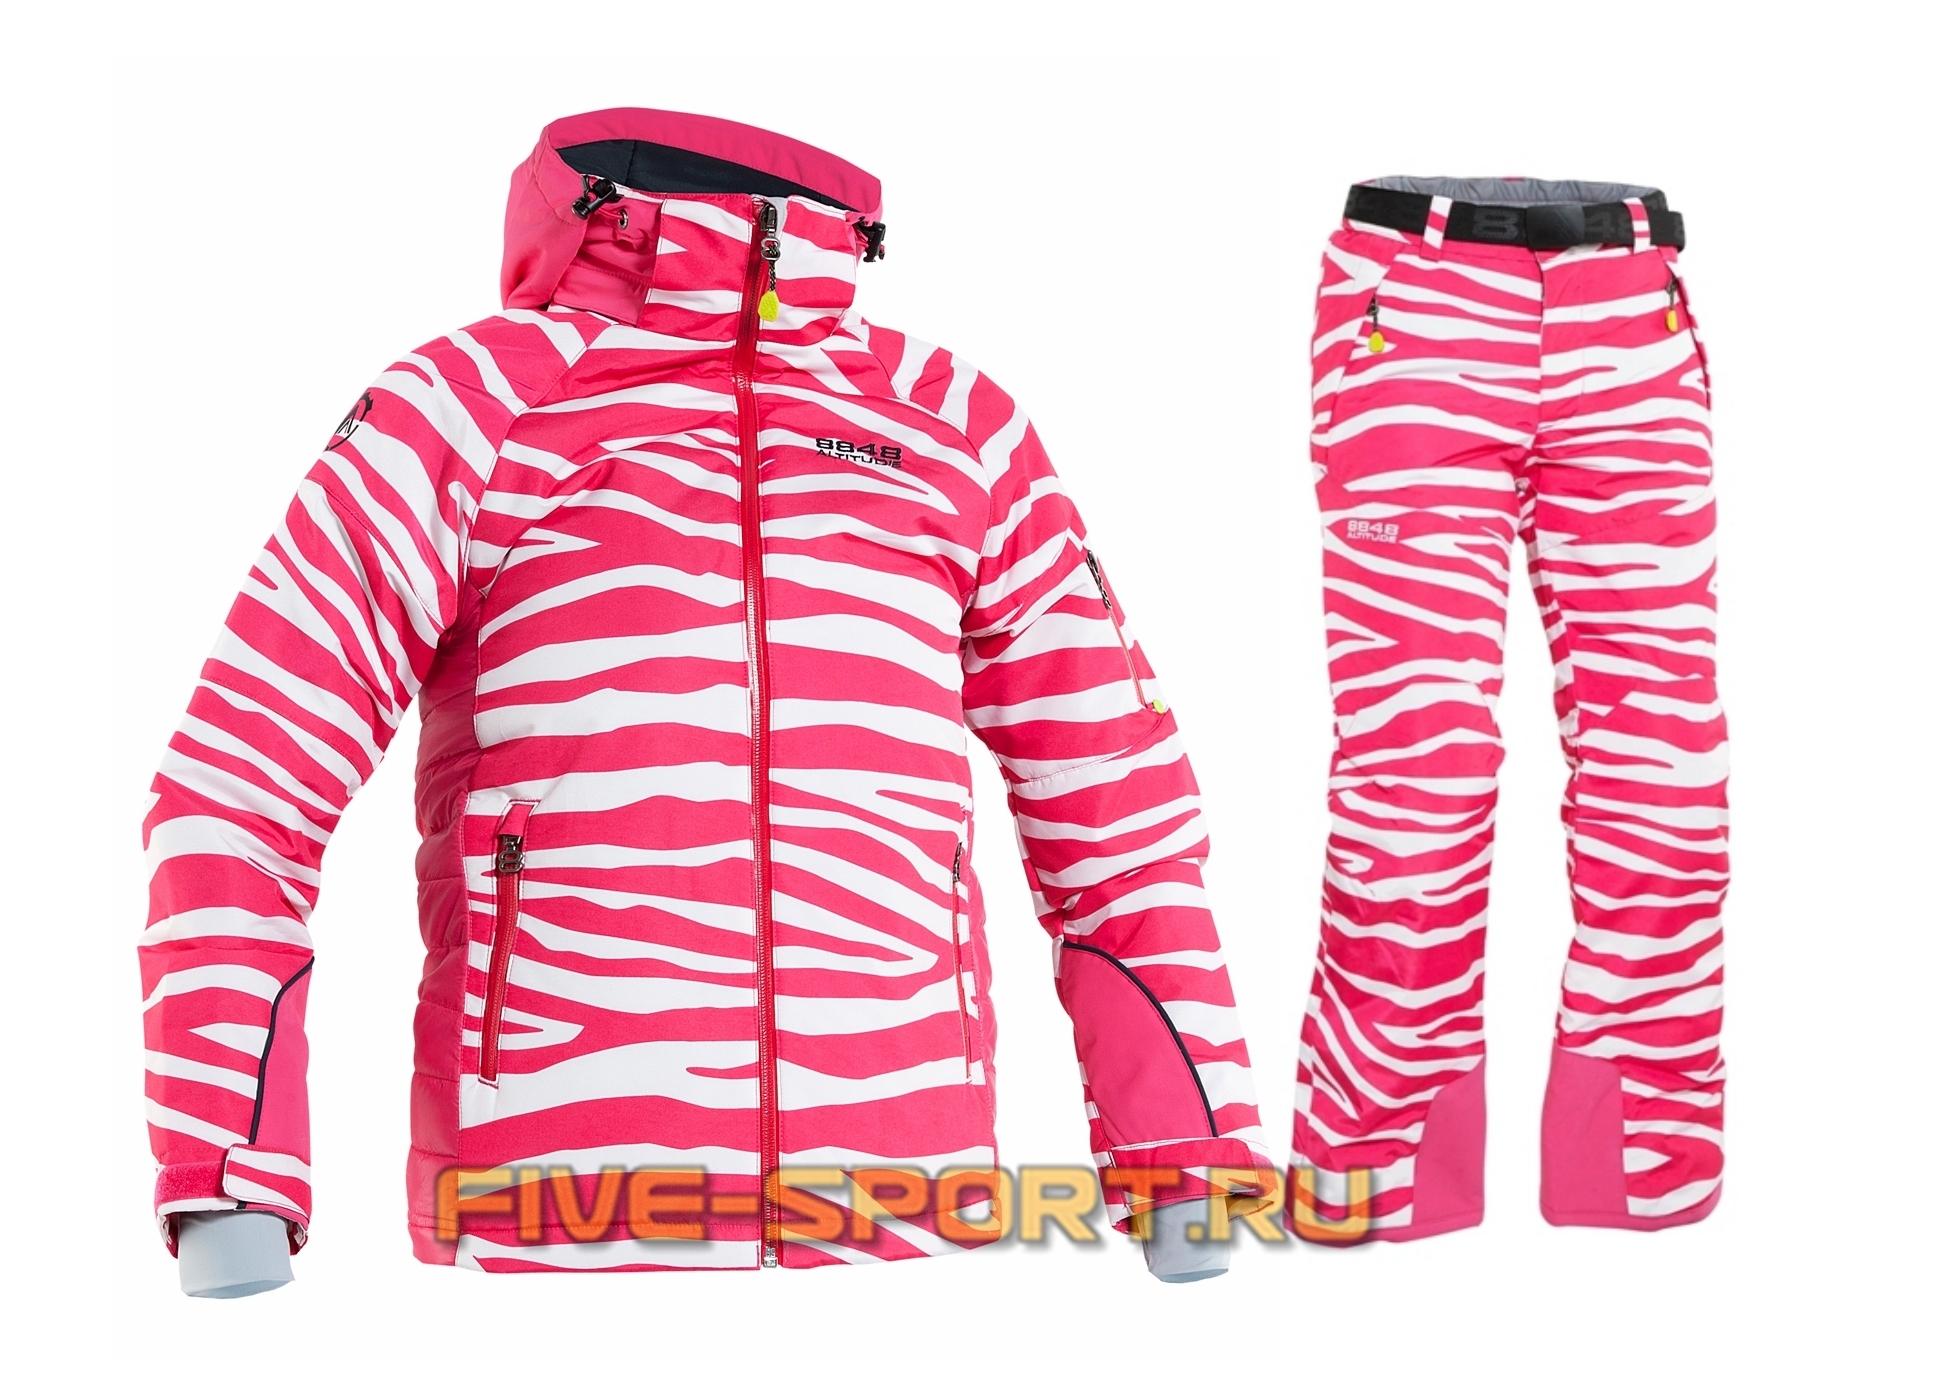 Костюм 8848 Altitude Rosalee/Cornwall cerise zebra  (8561H7-8564H7)